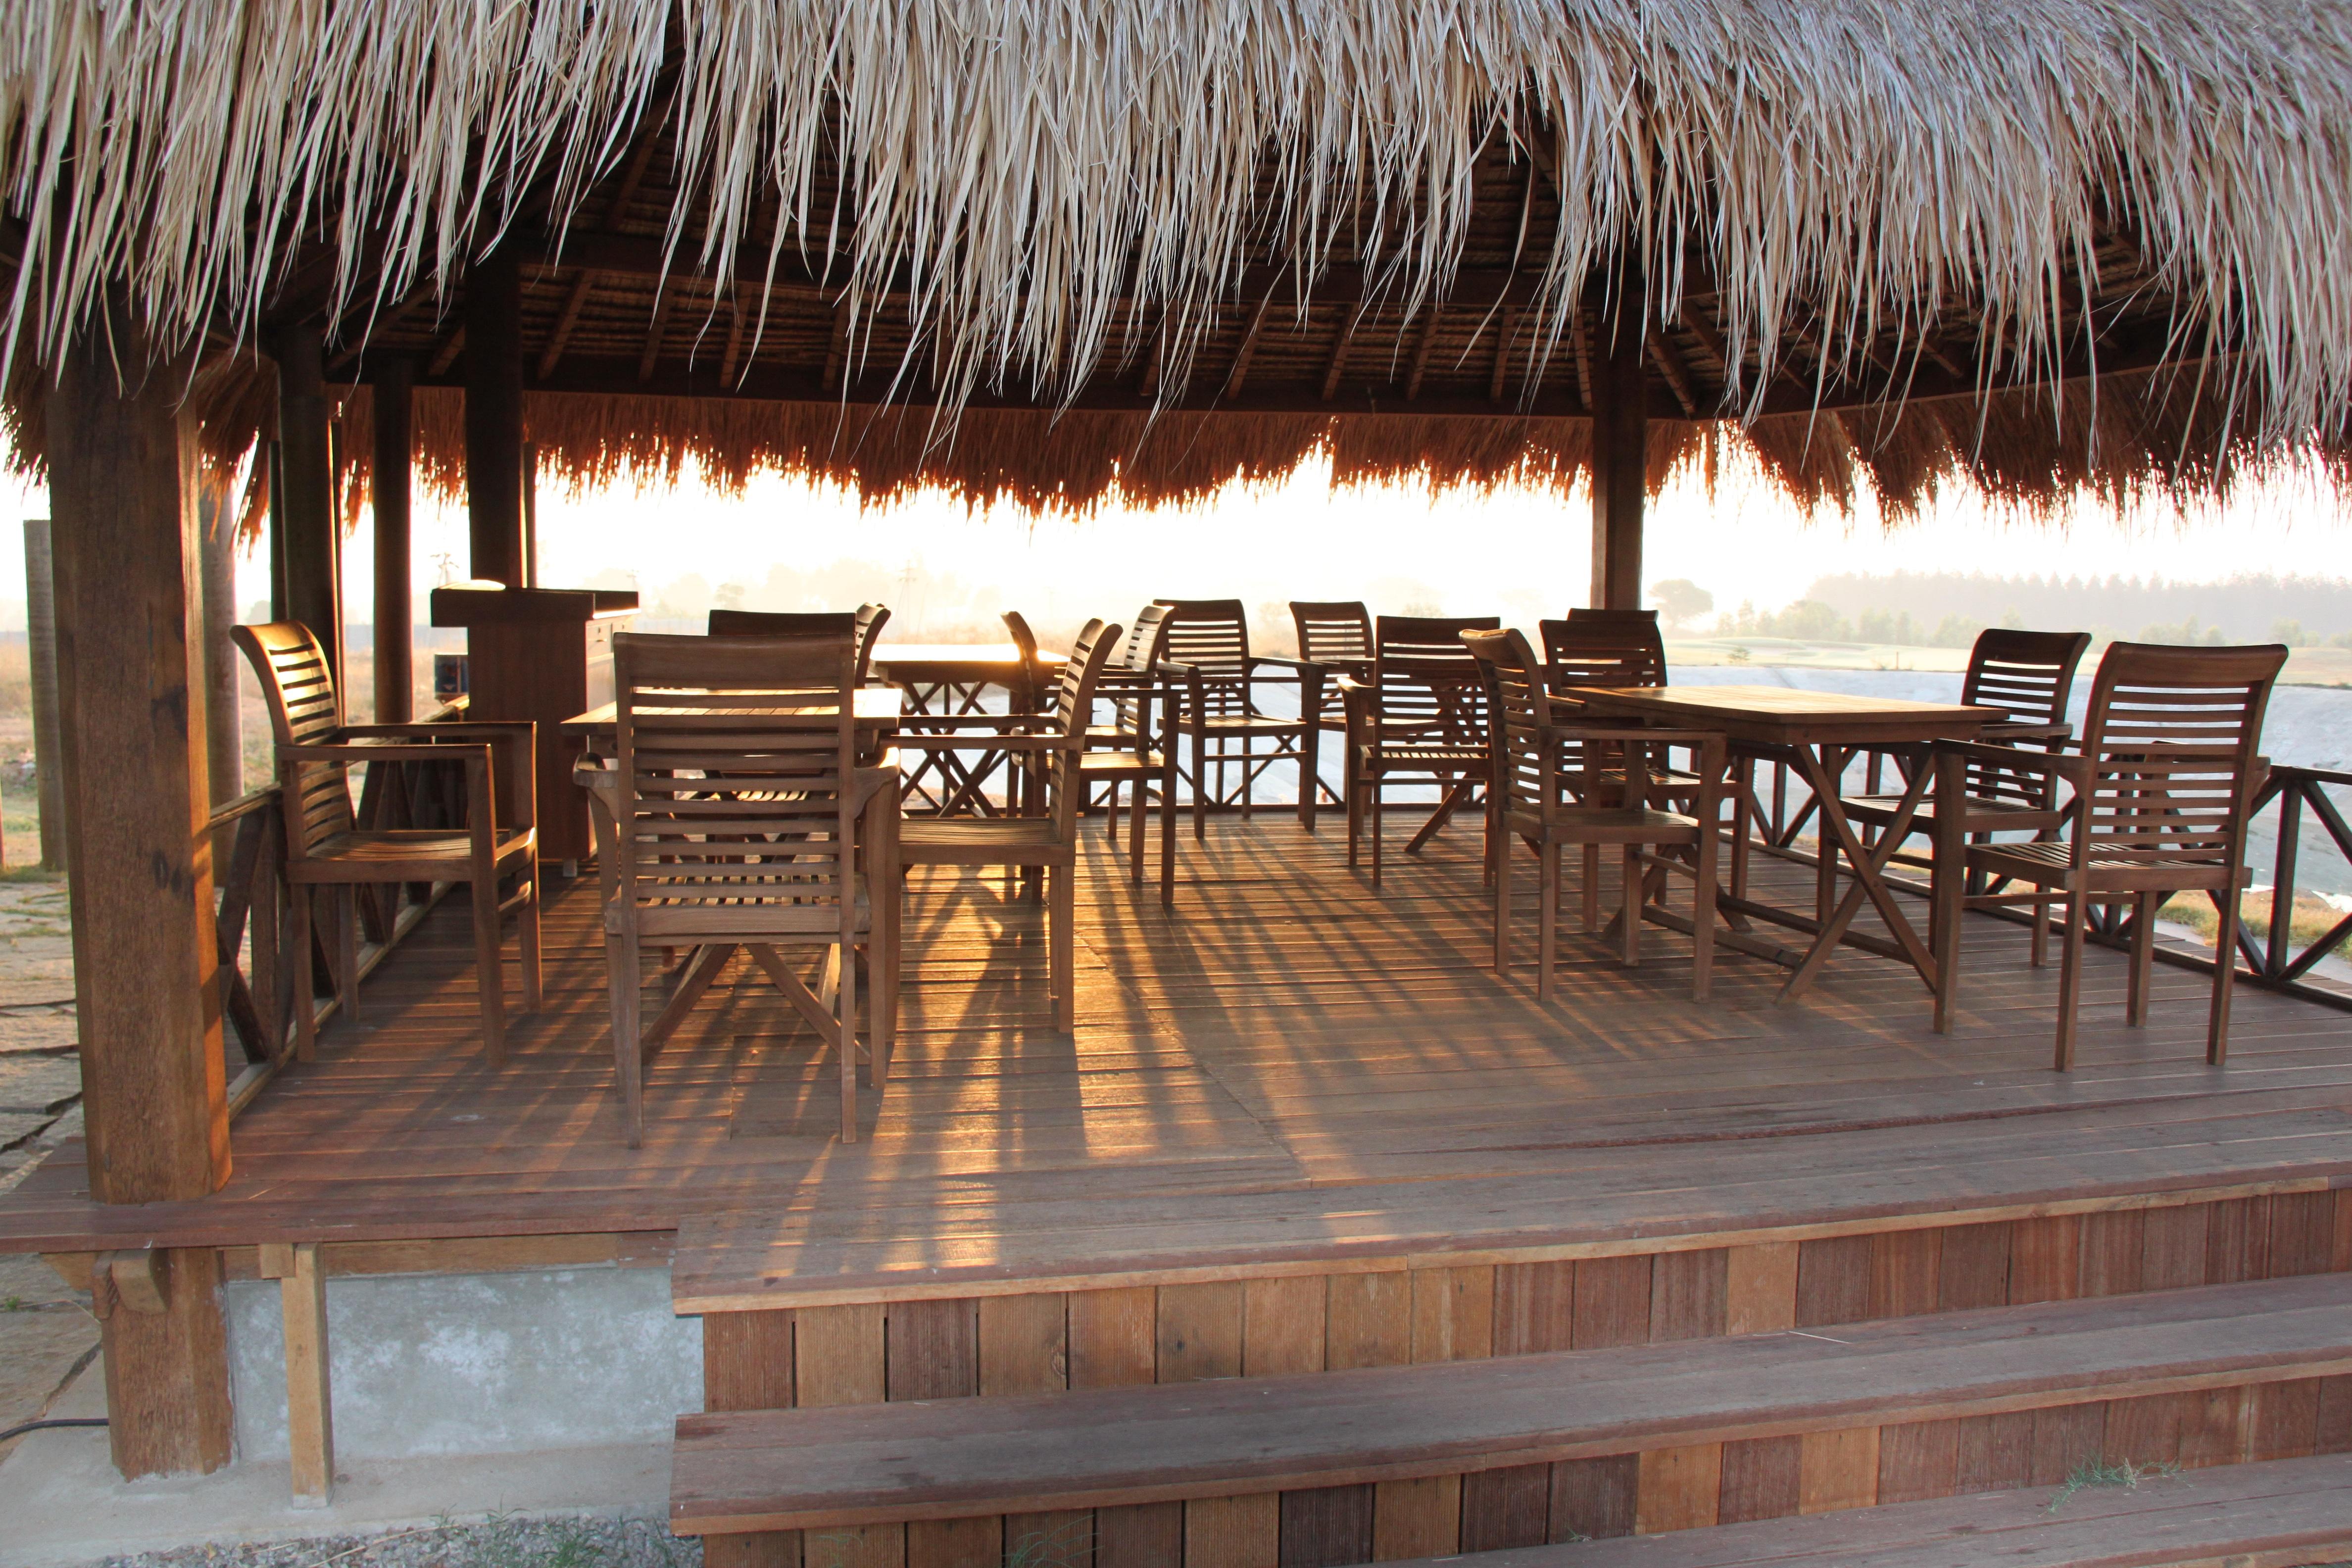 Fotos gratis : mesa, césped, al aire libre, arquitectura, madera ...